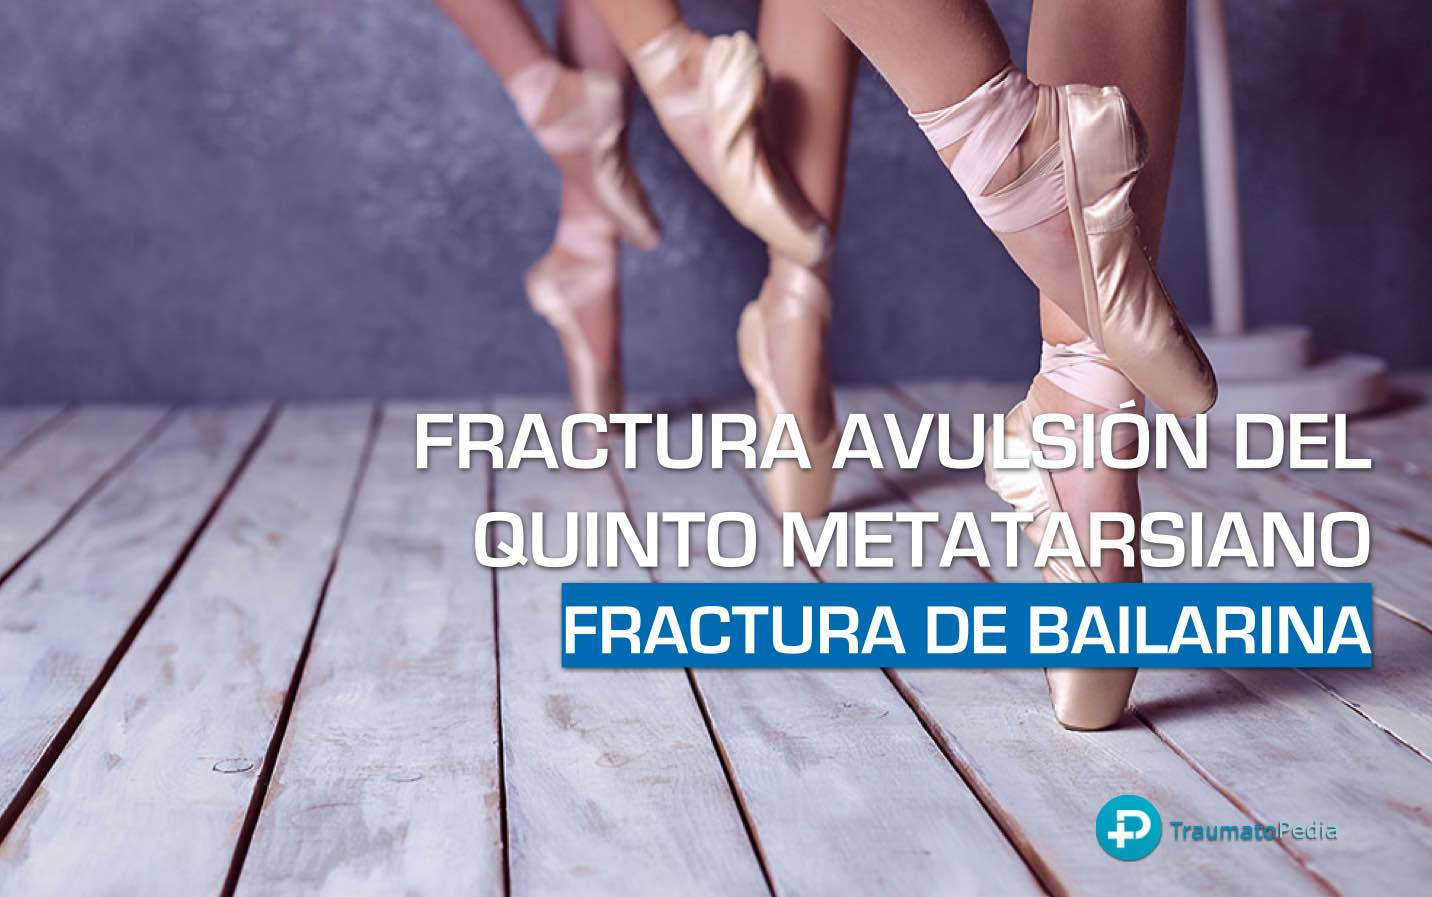 fractura avulsión quinto metatarsiano bailarina